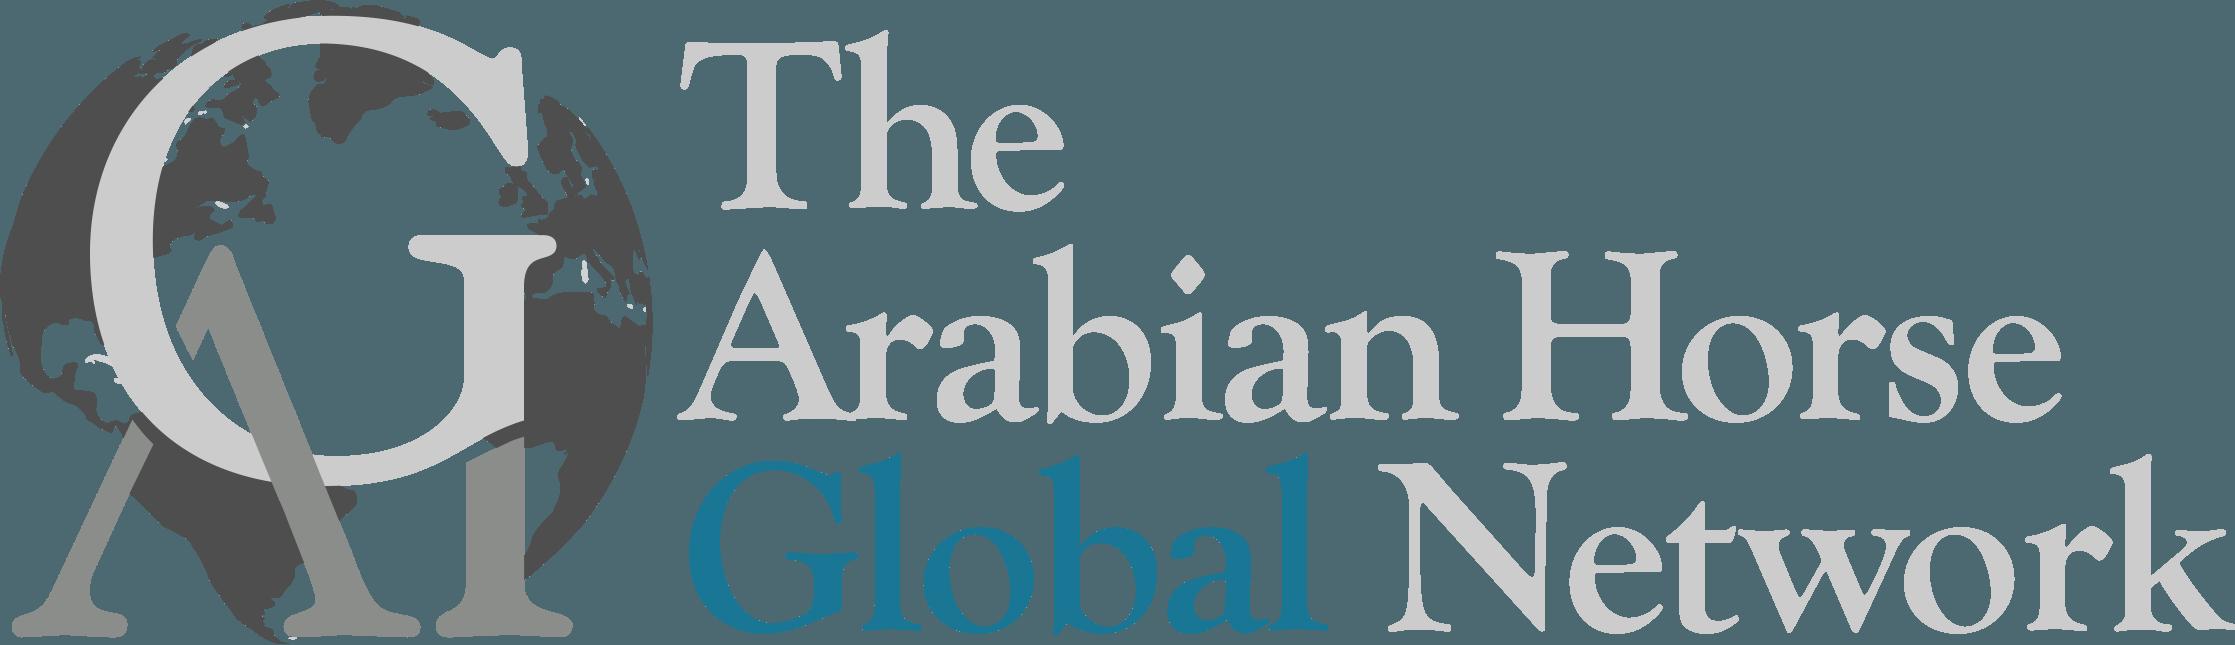 Phoenix clipart arabian. Arabianhorseblog com you can